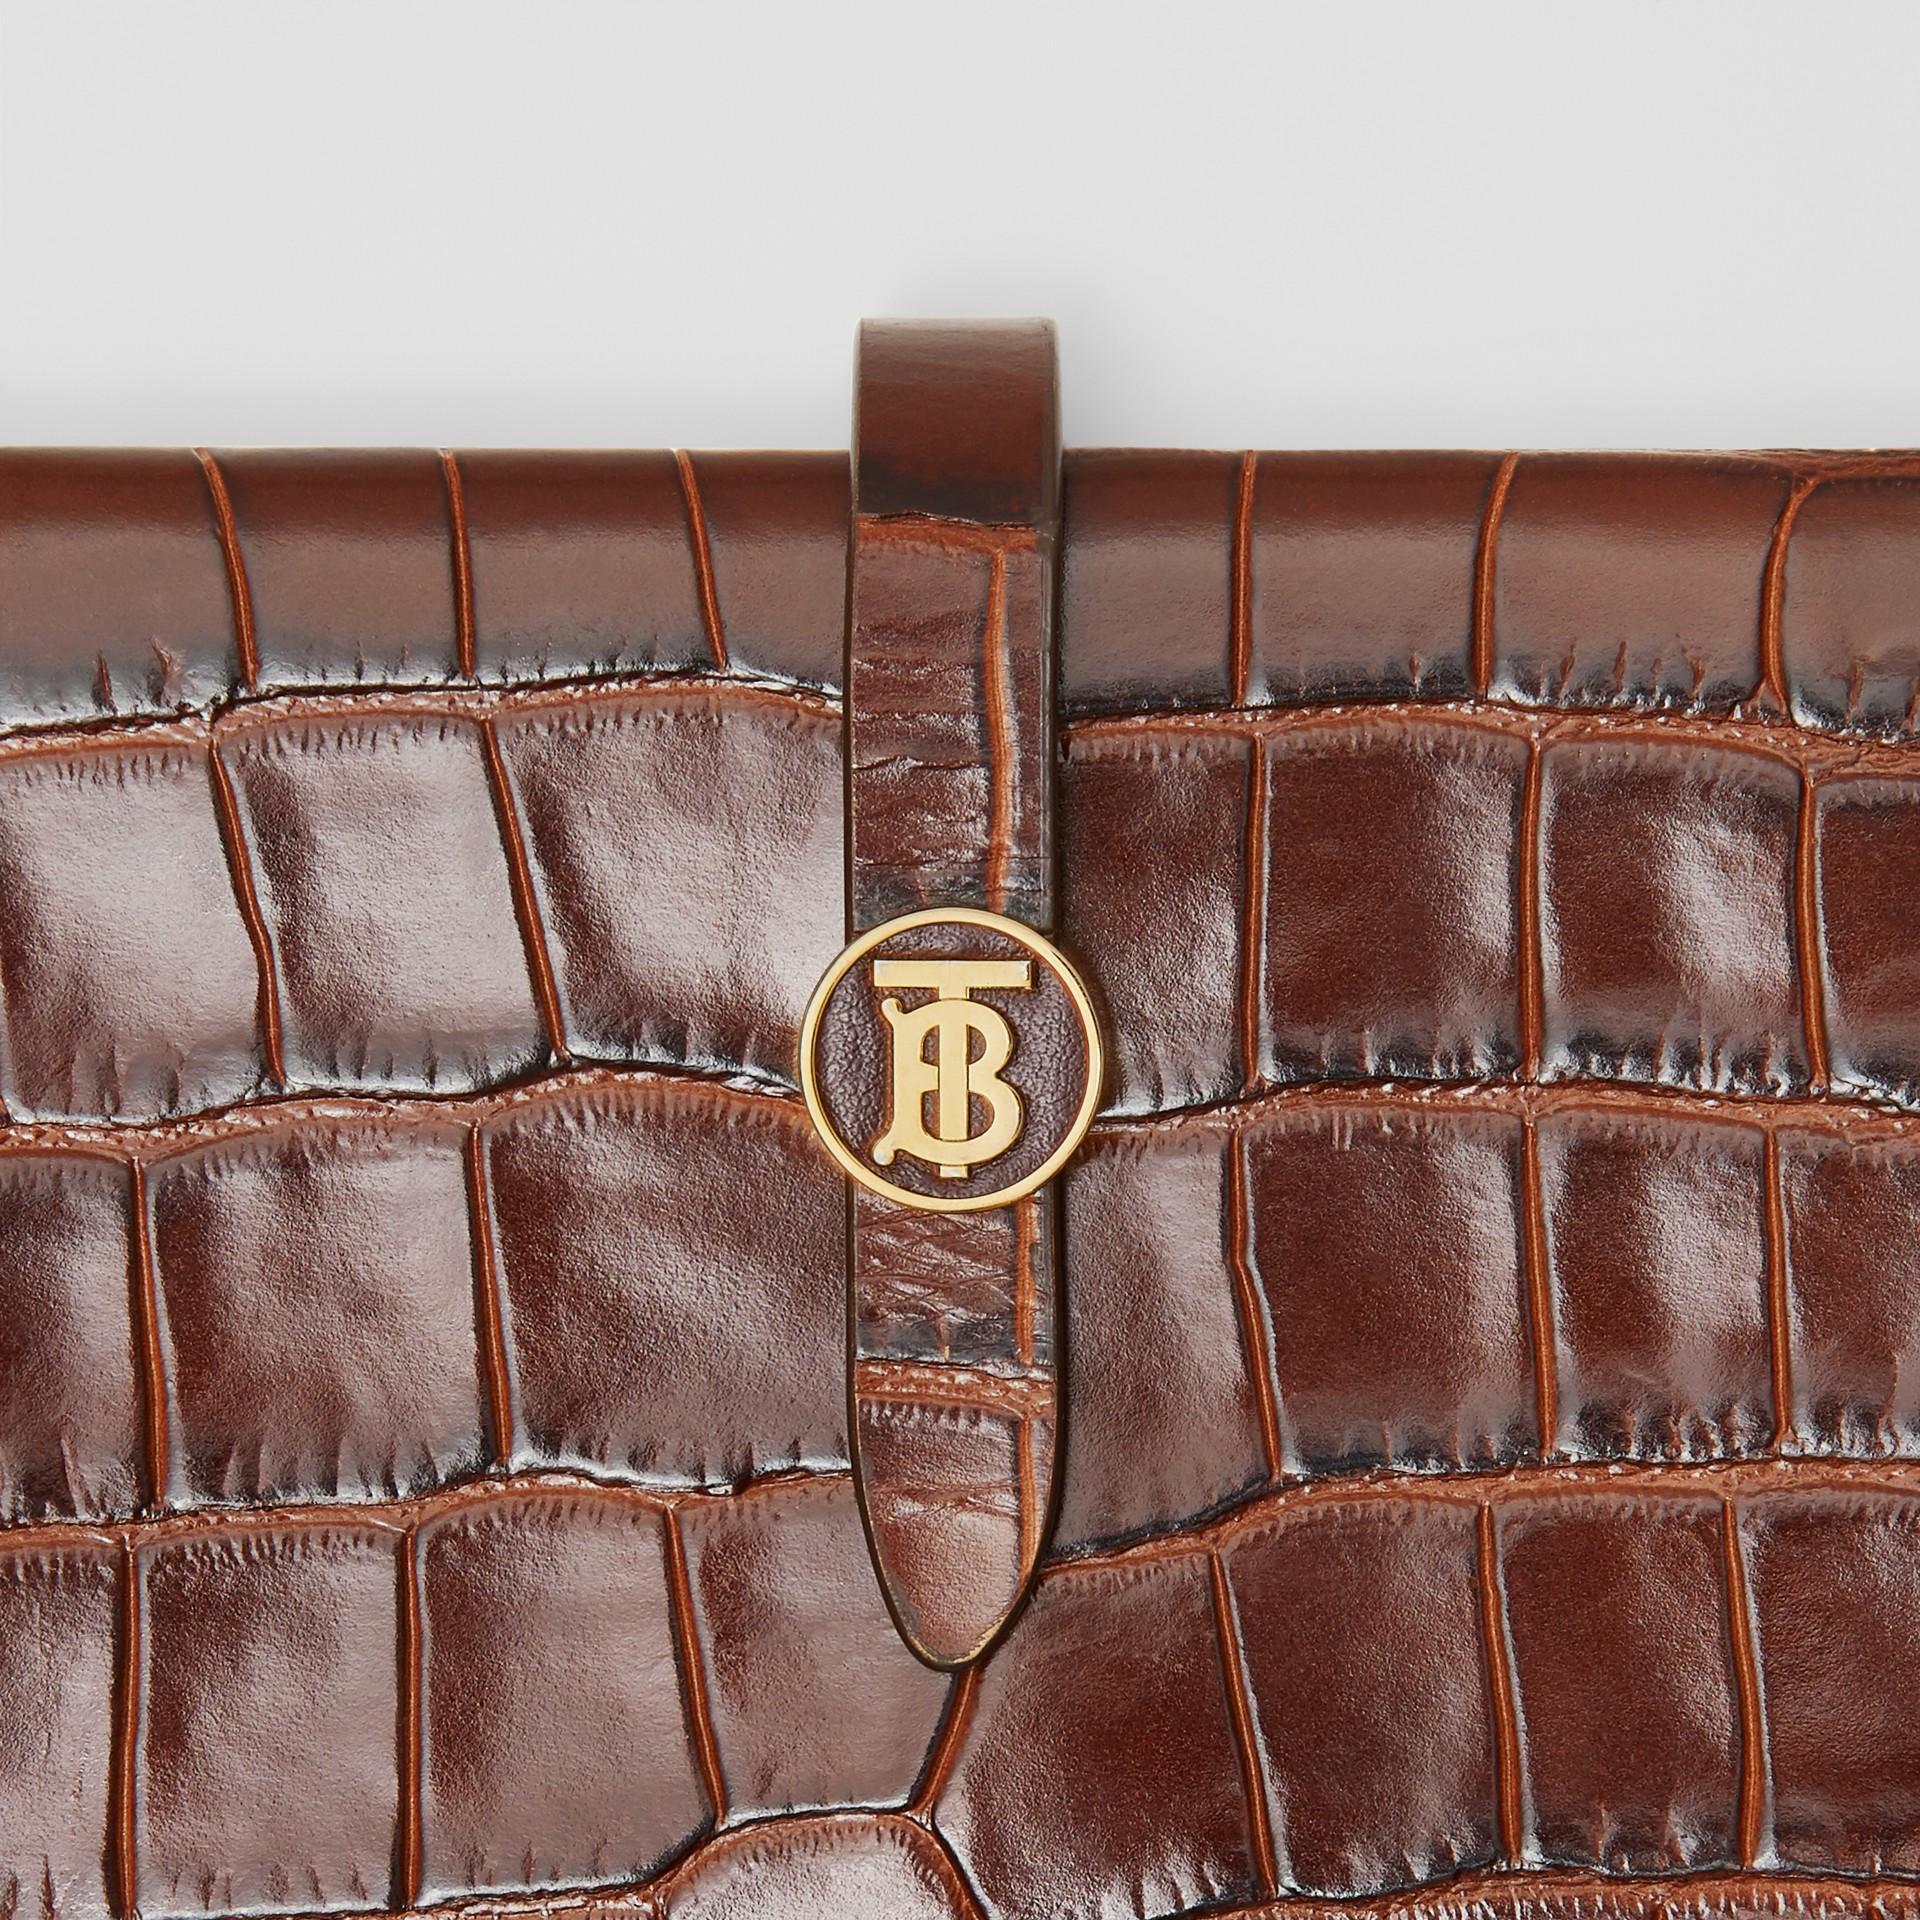 Monogram Motif Embossed Leather Folding Wallet in Tan - Women | Burberry - gallery image 1